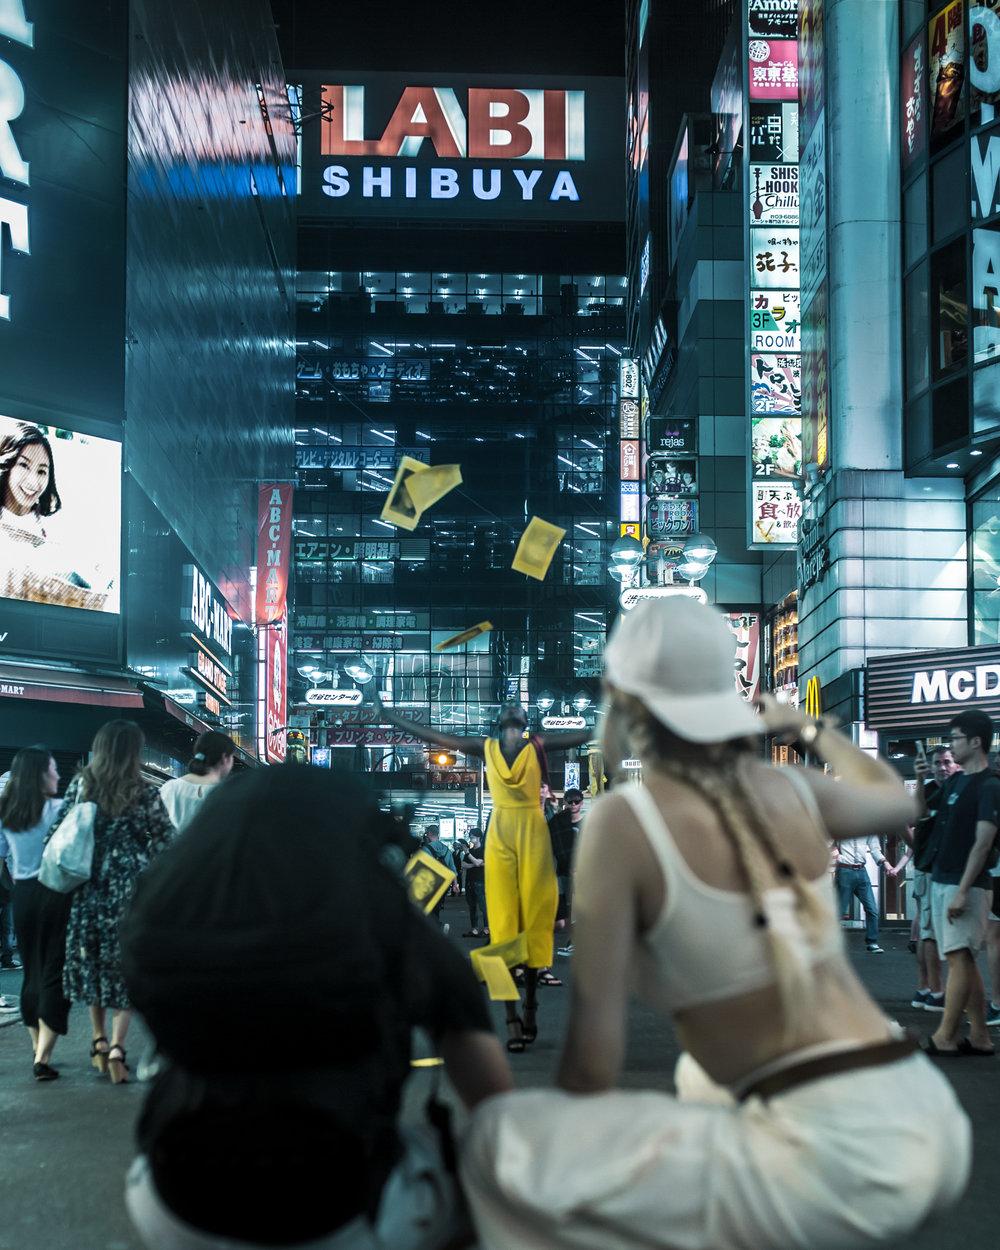 japan-music-video-benjaminandrew.jpg